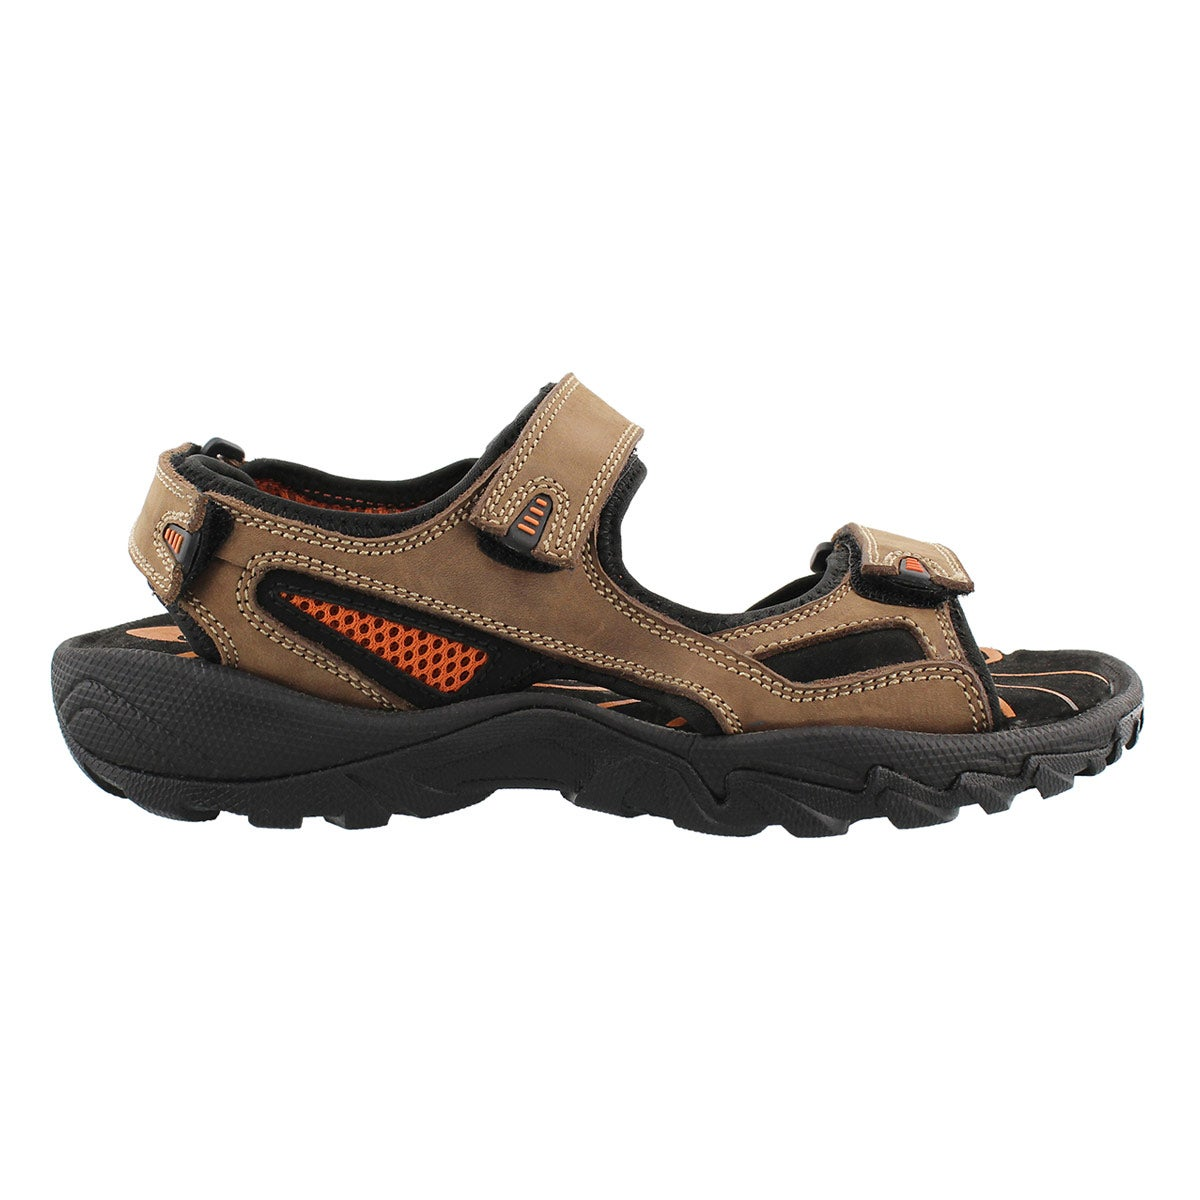 Mns Lucius brown 3 strap sandal